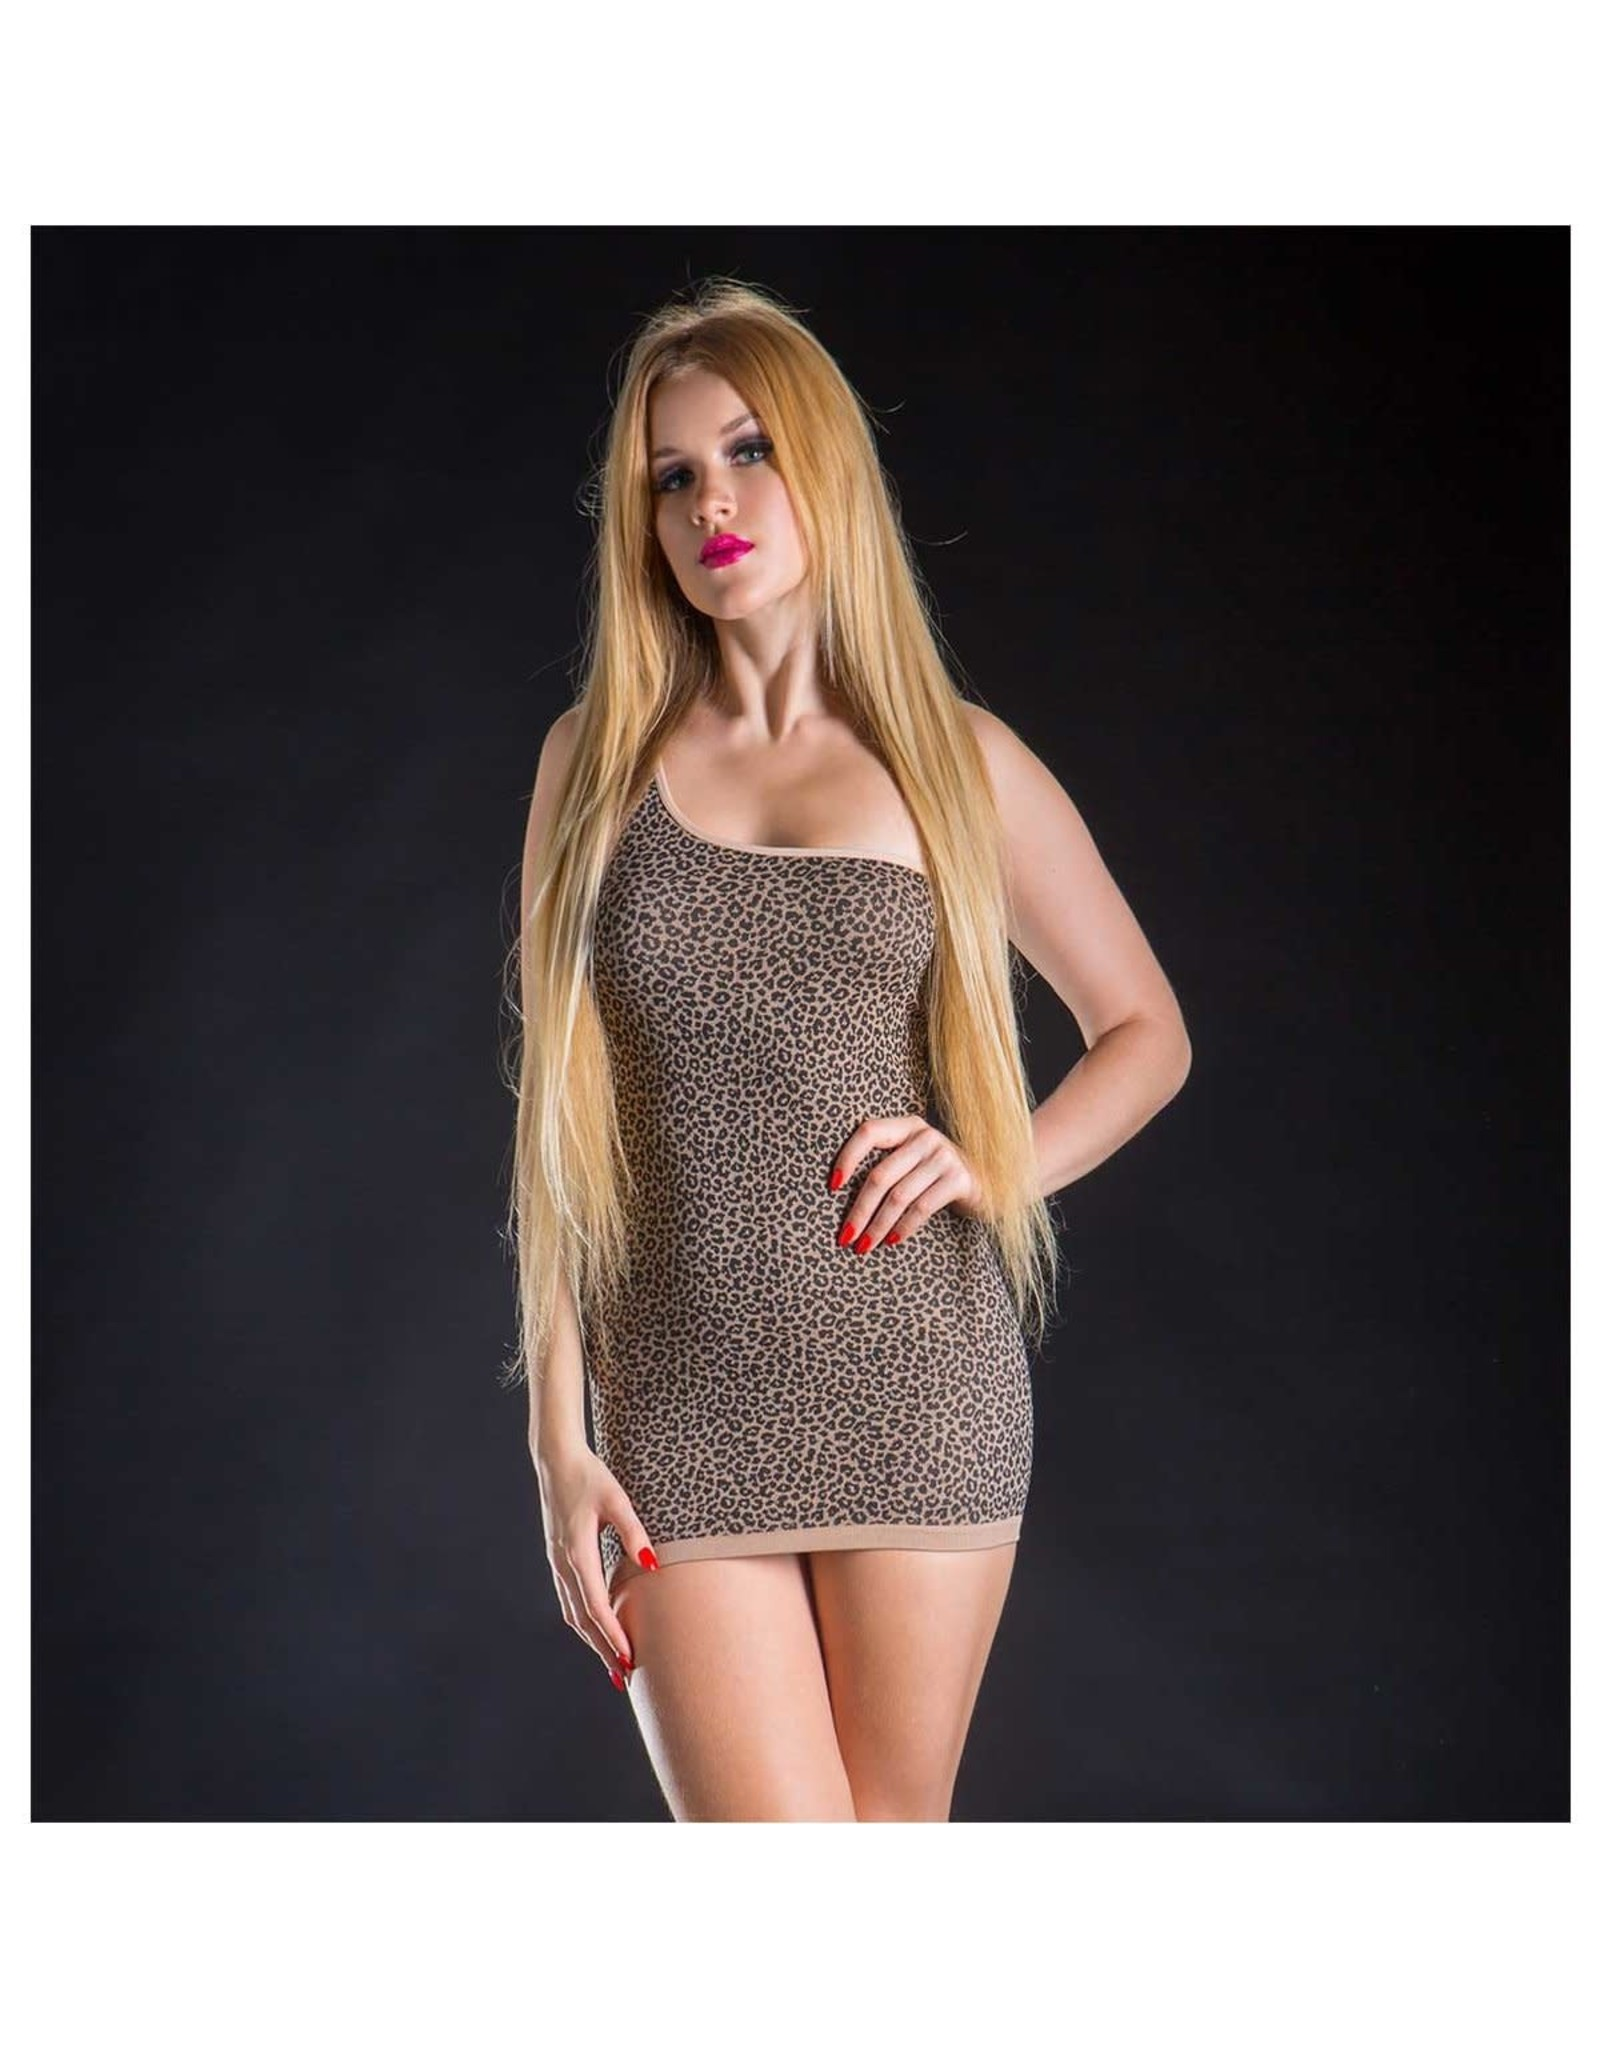 Beverly Hills - Naughty Girl Beverly Hills Naughty Girl - 2 in 1 Dress - Leopard